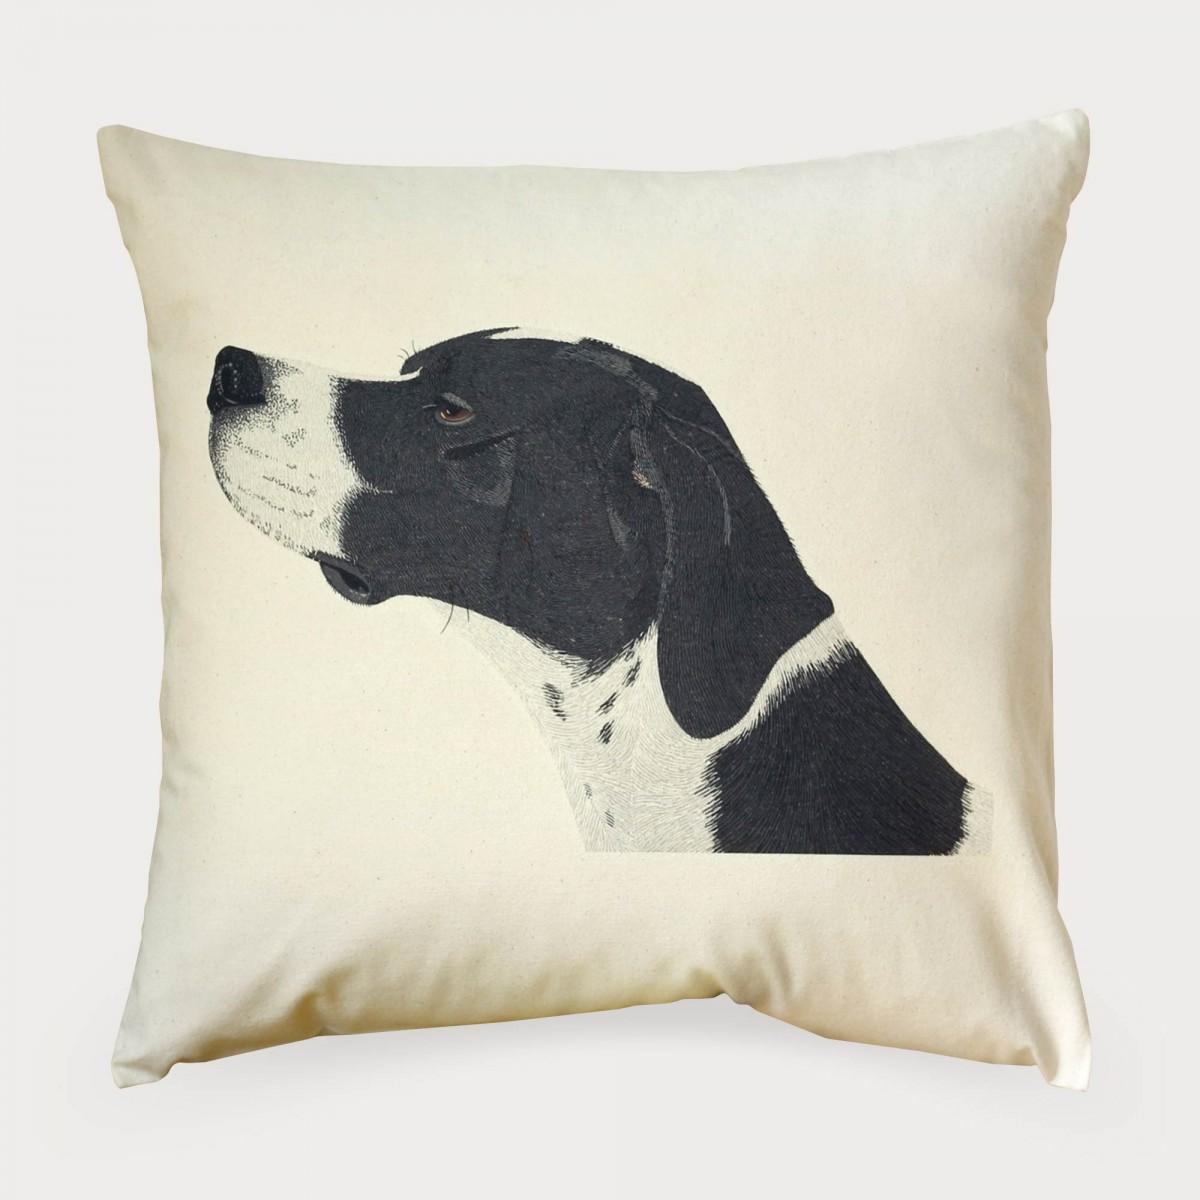 English Pointer Dog Cushion Cover